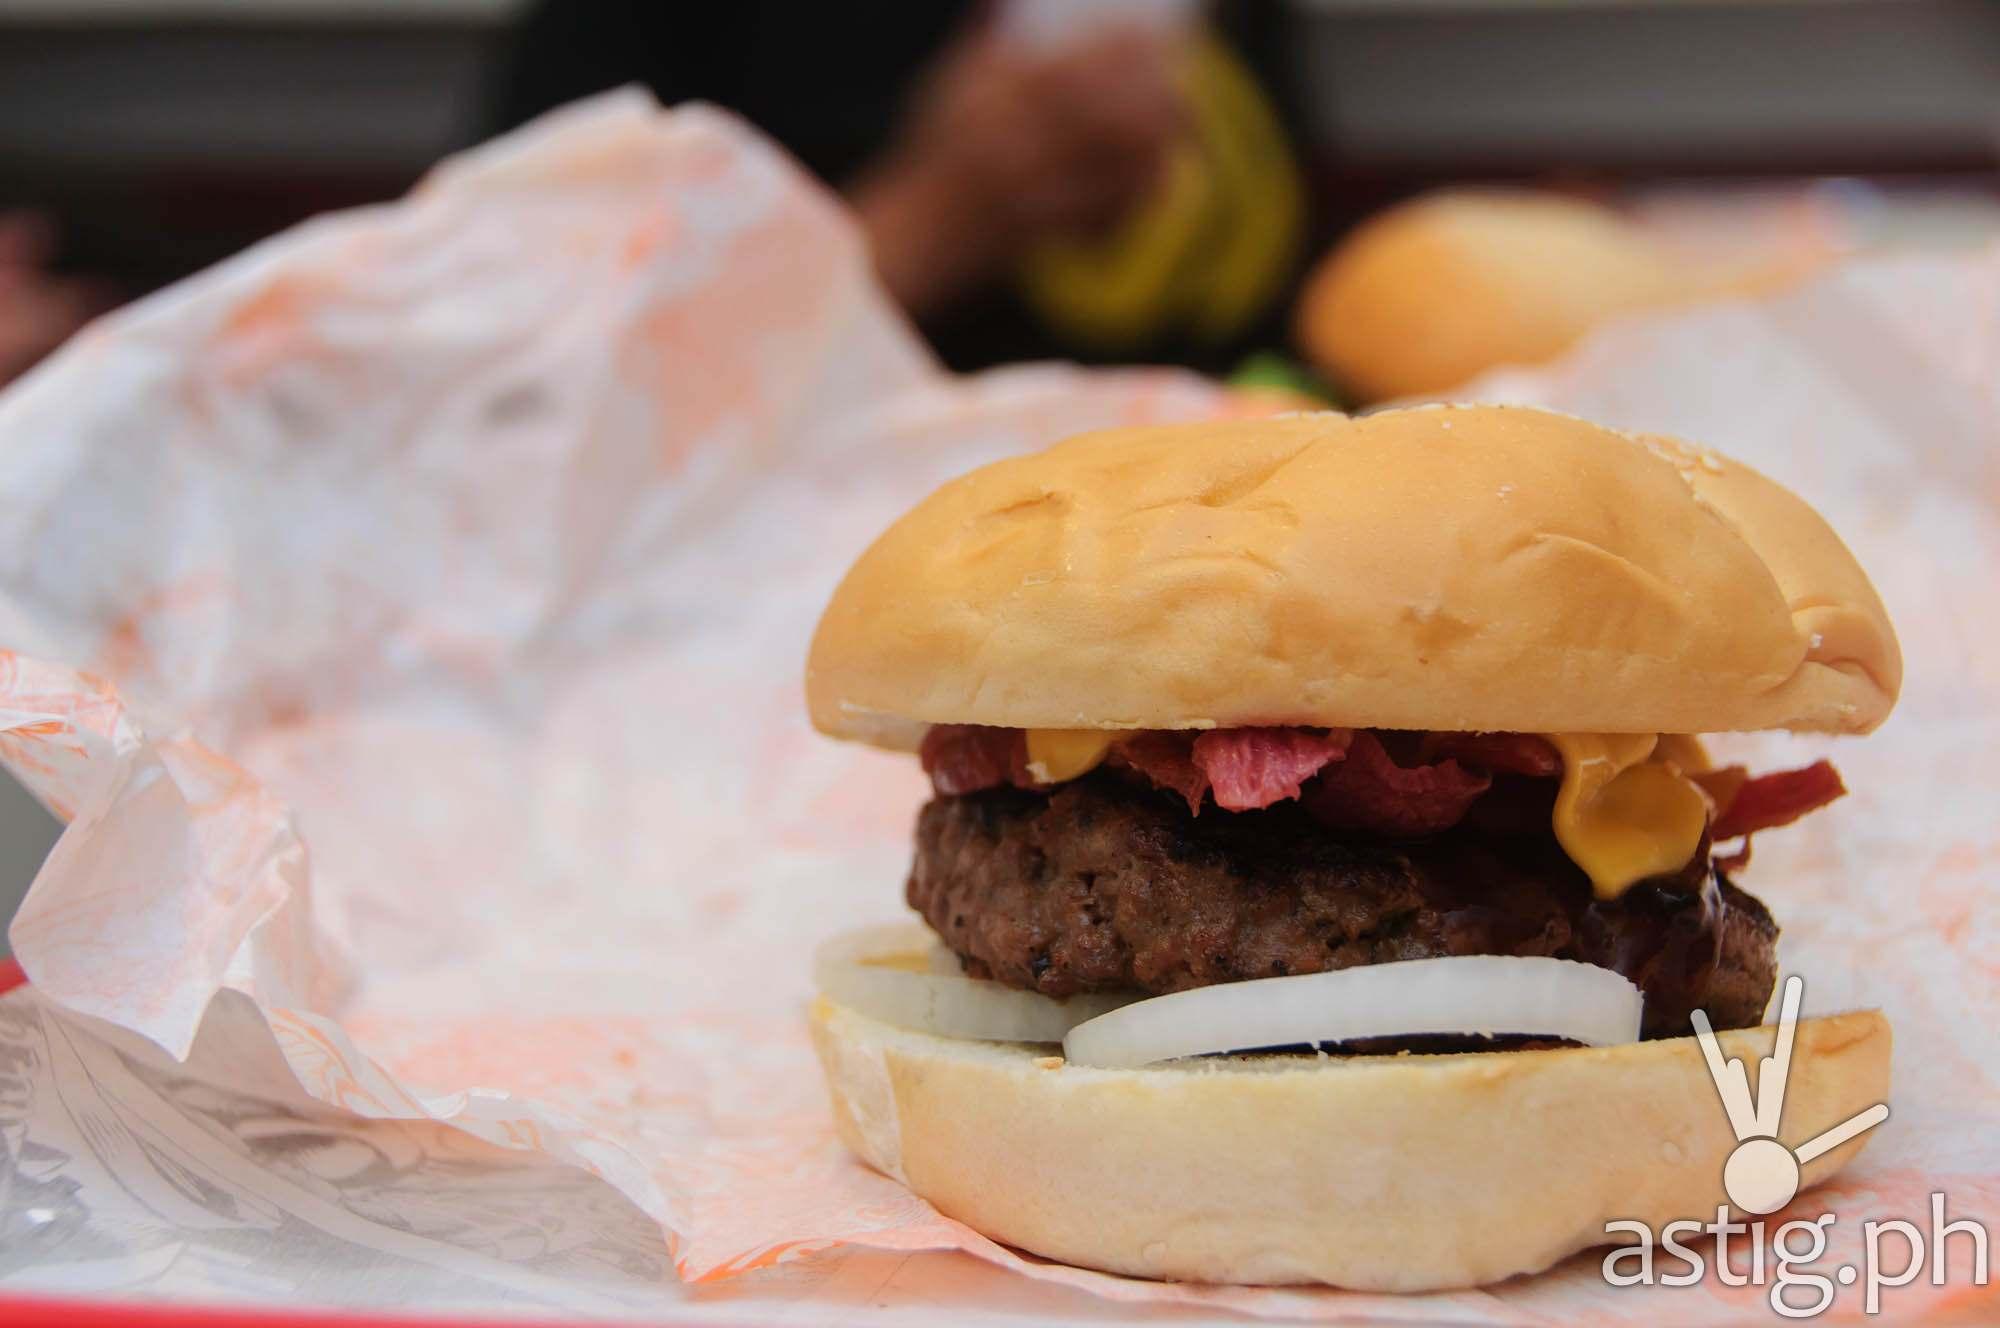 Bronco Burger at Wham! Burger SM Mall of Asia